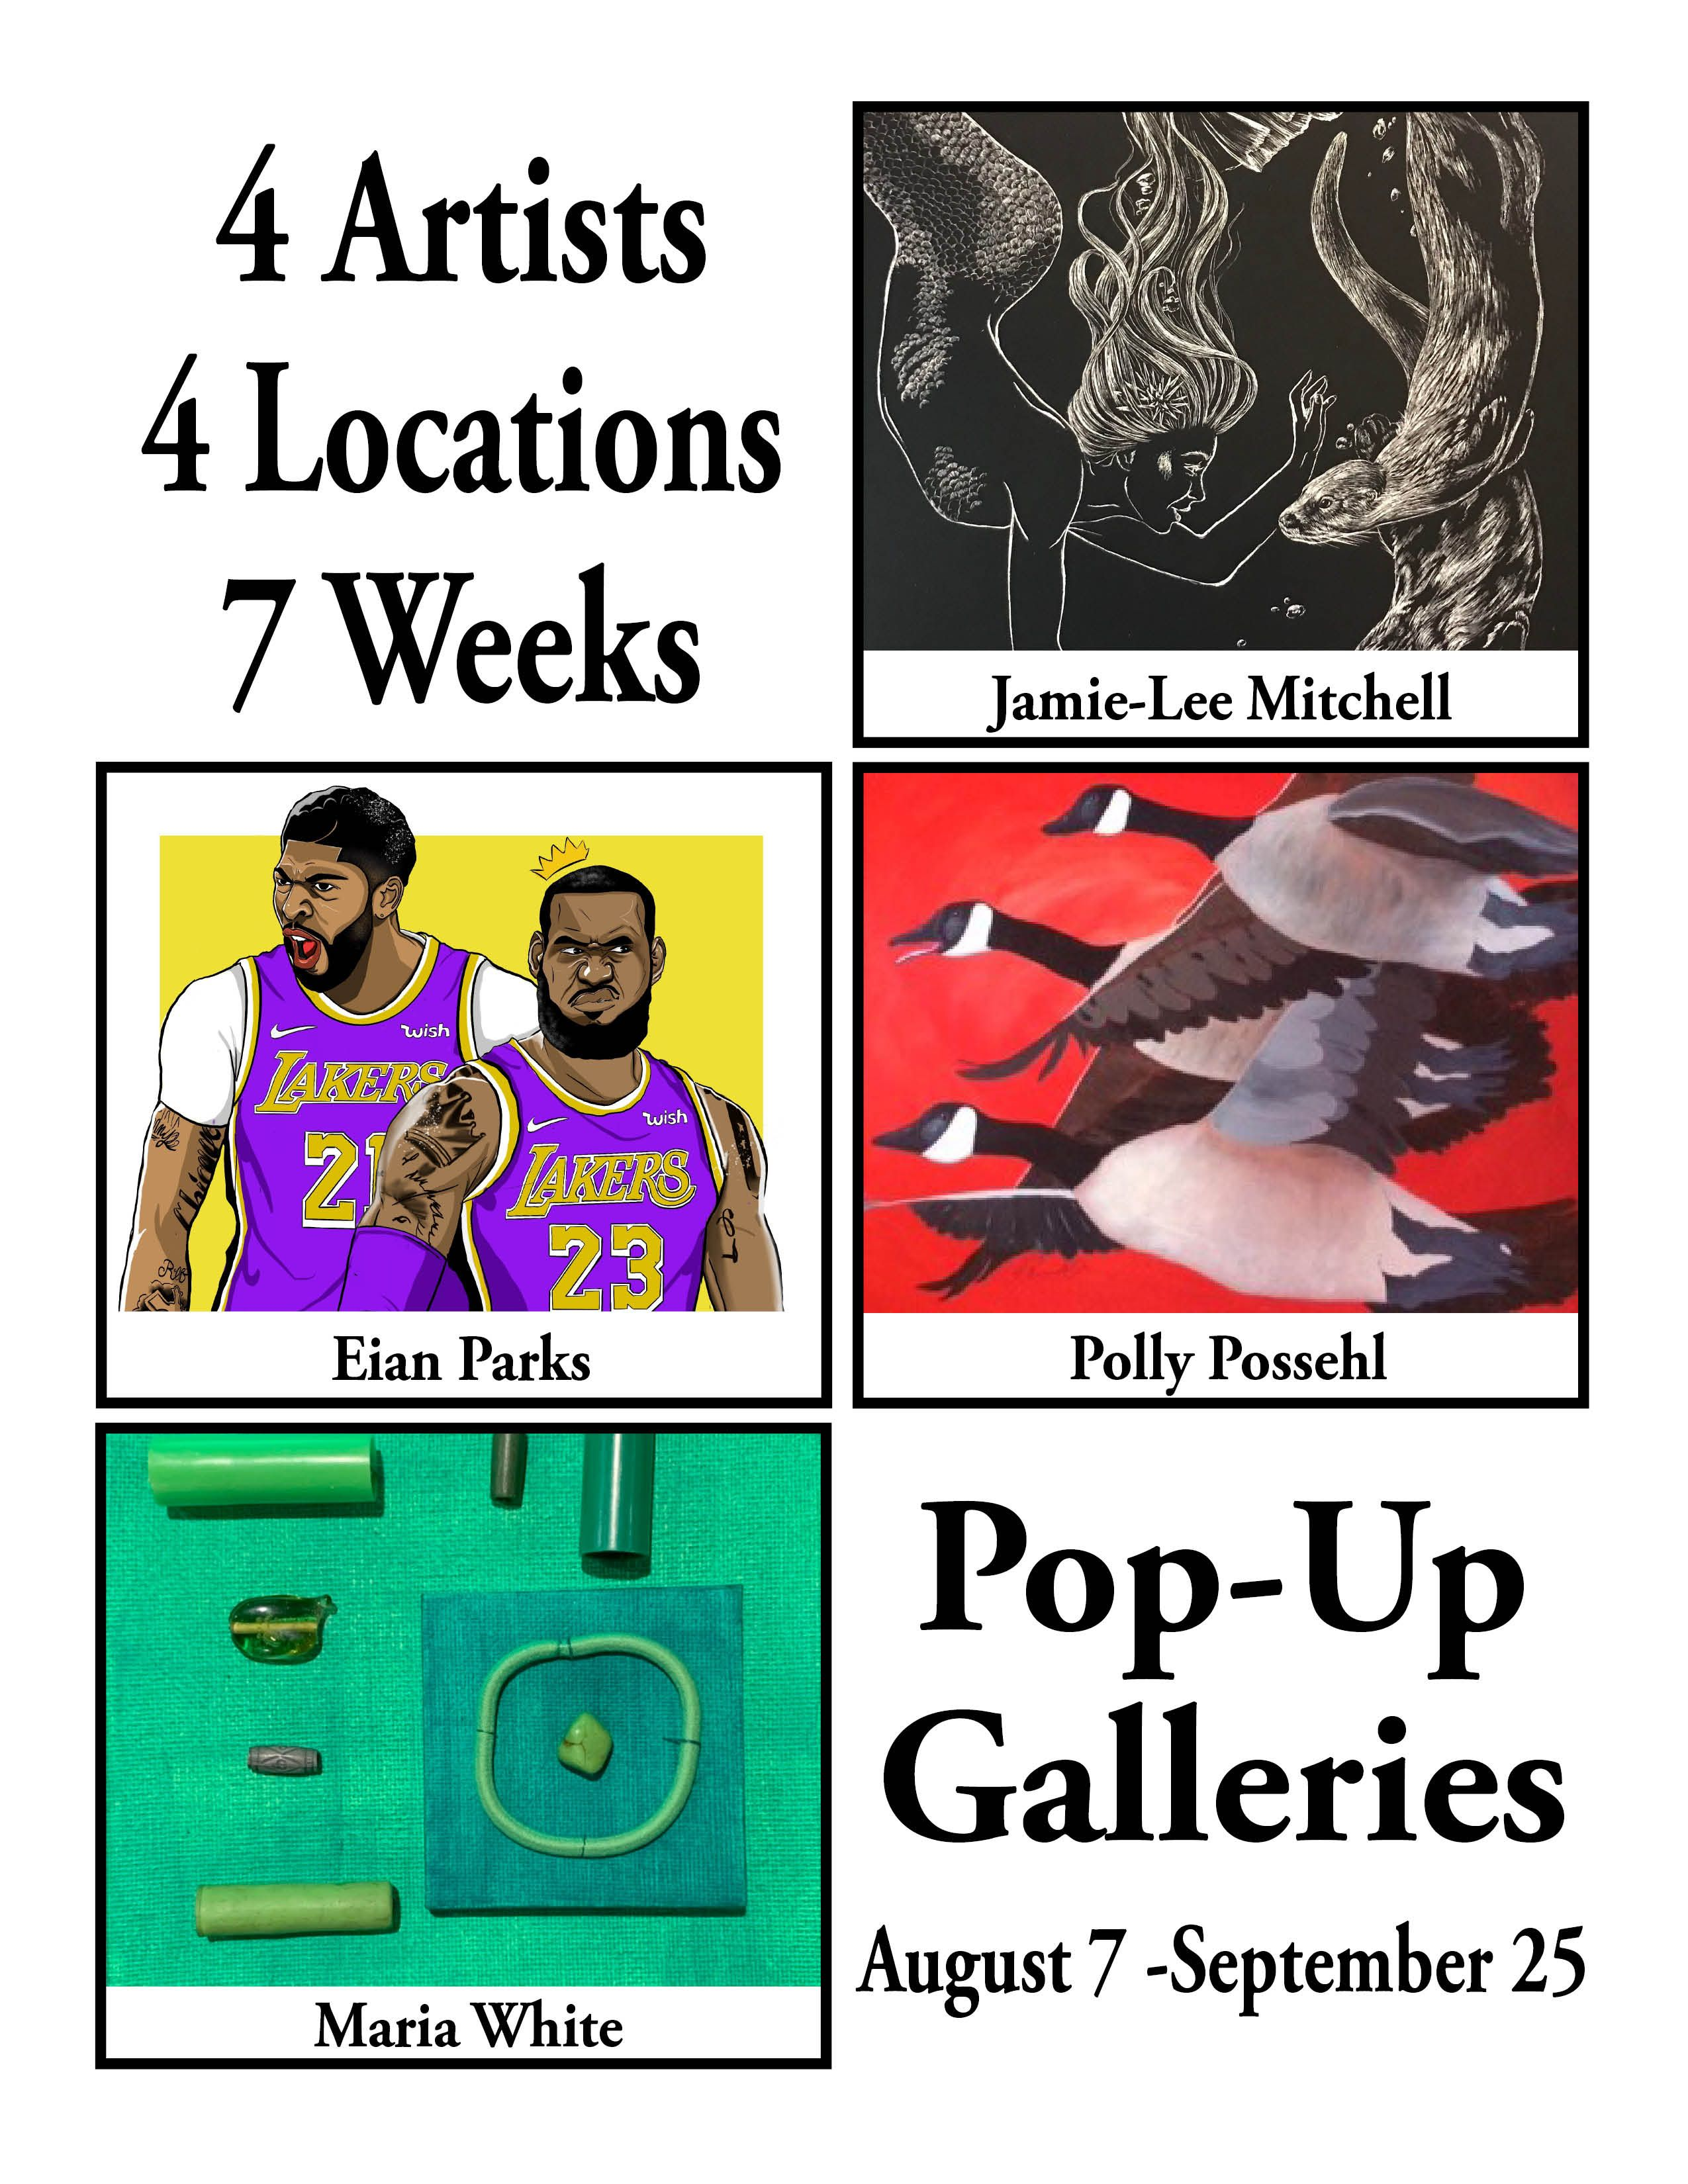 447 Pop-Up Galleries